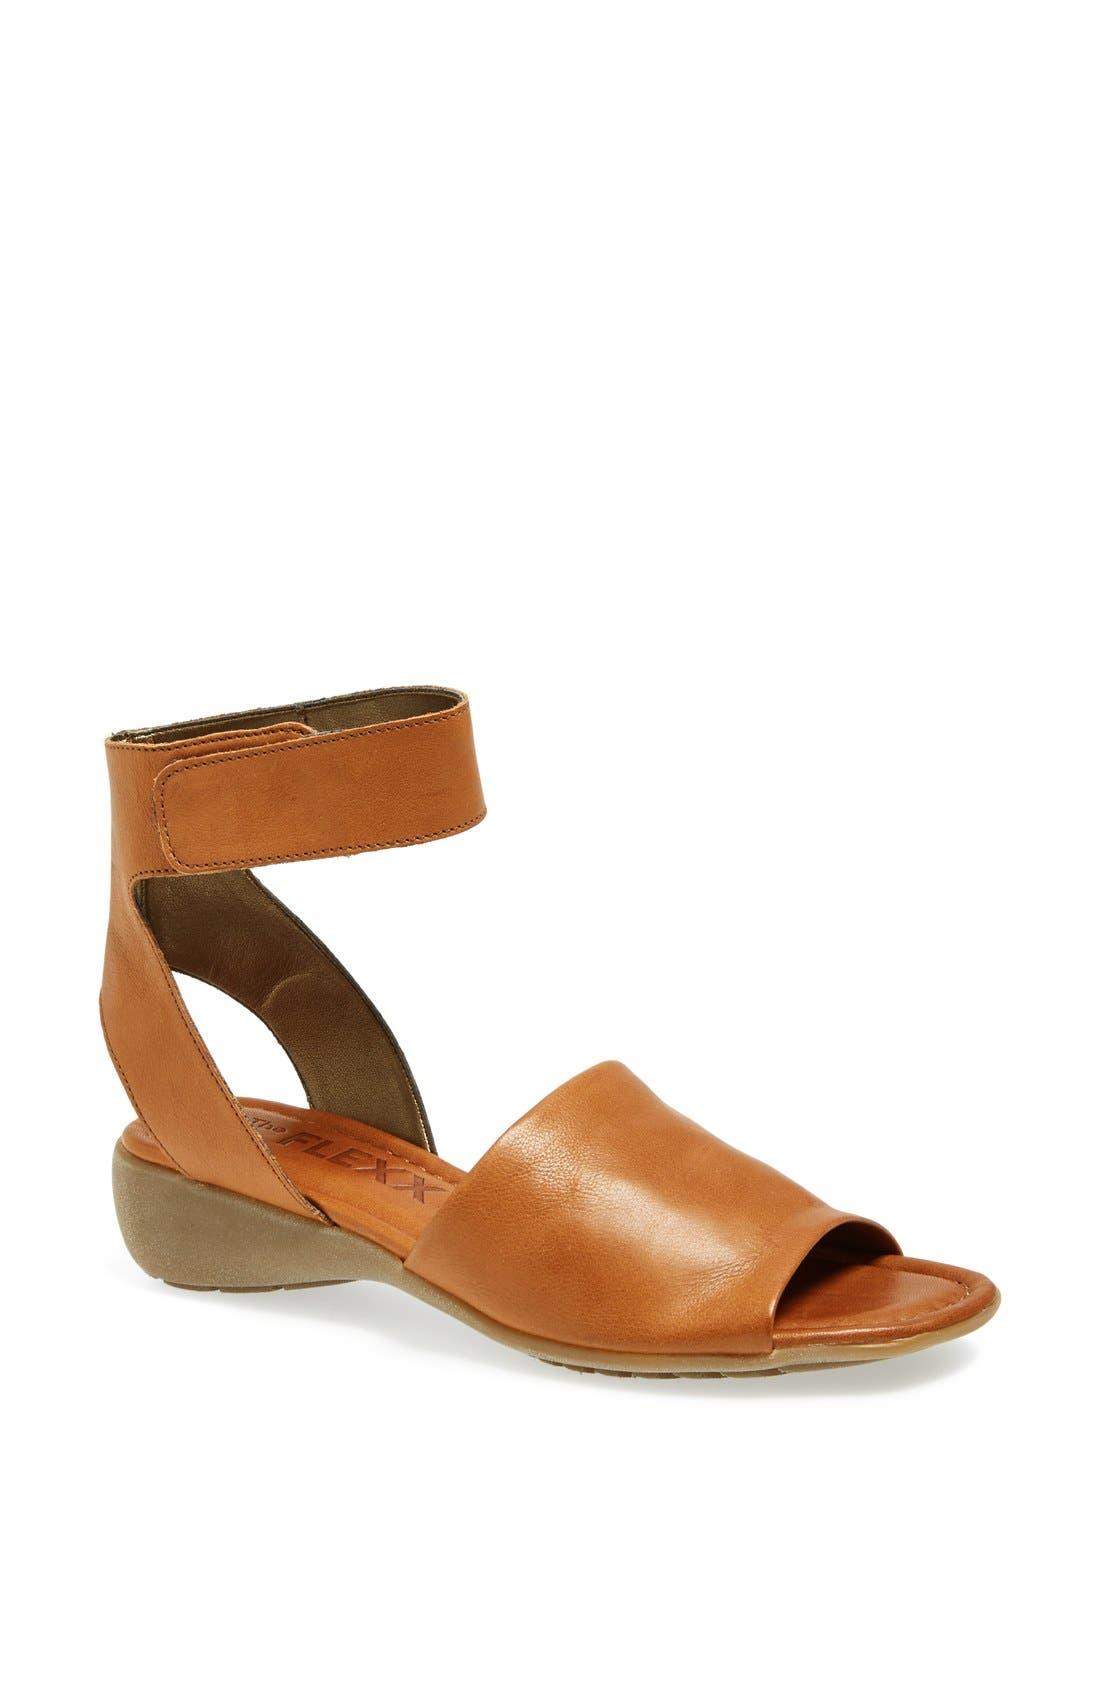 'Beglad' Leather Ankle Strap Sandal,                             Main thumbnail 10, color,